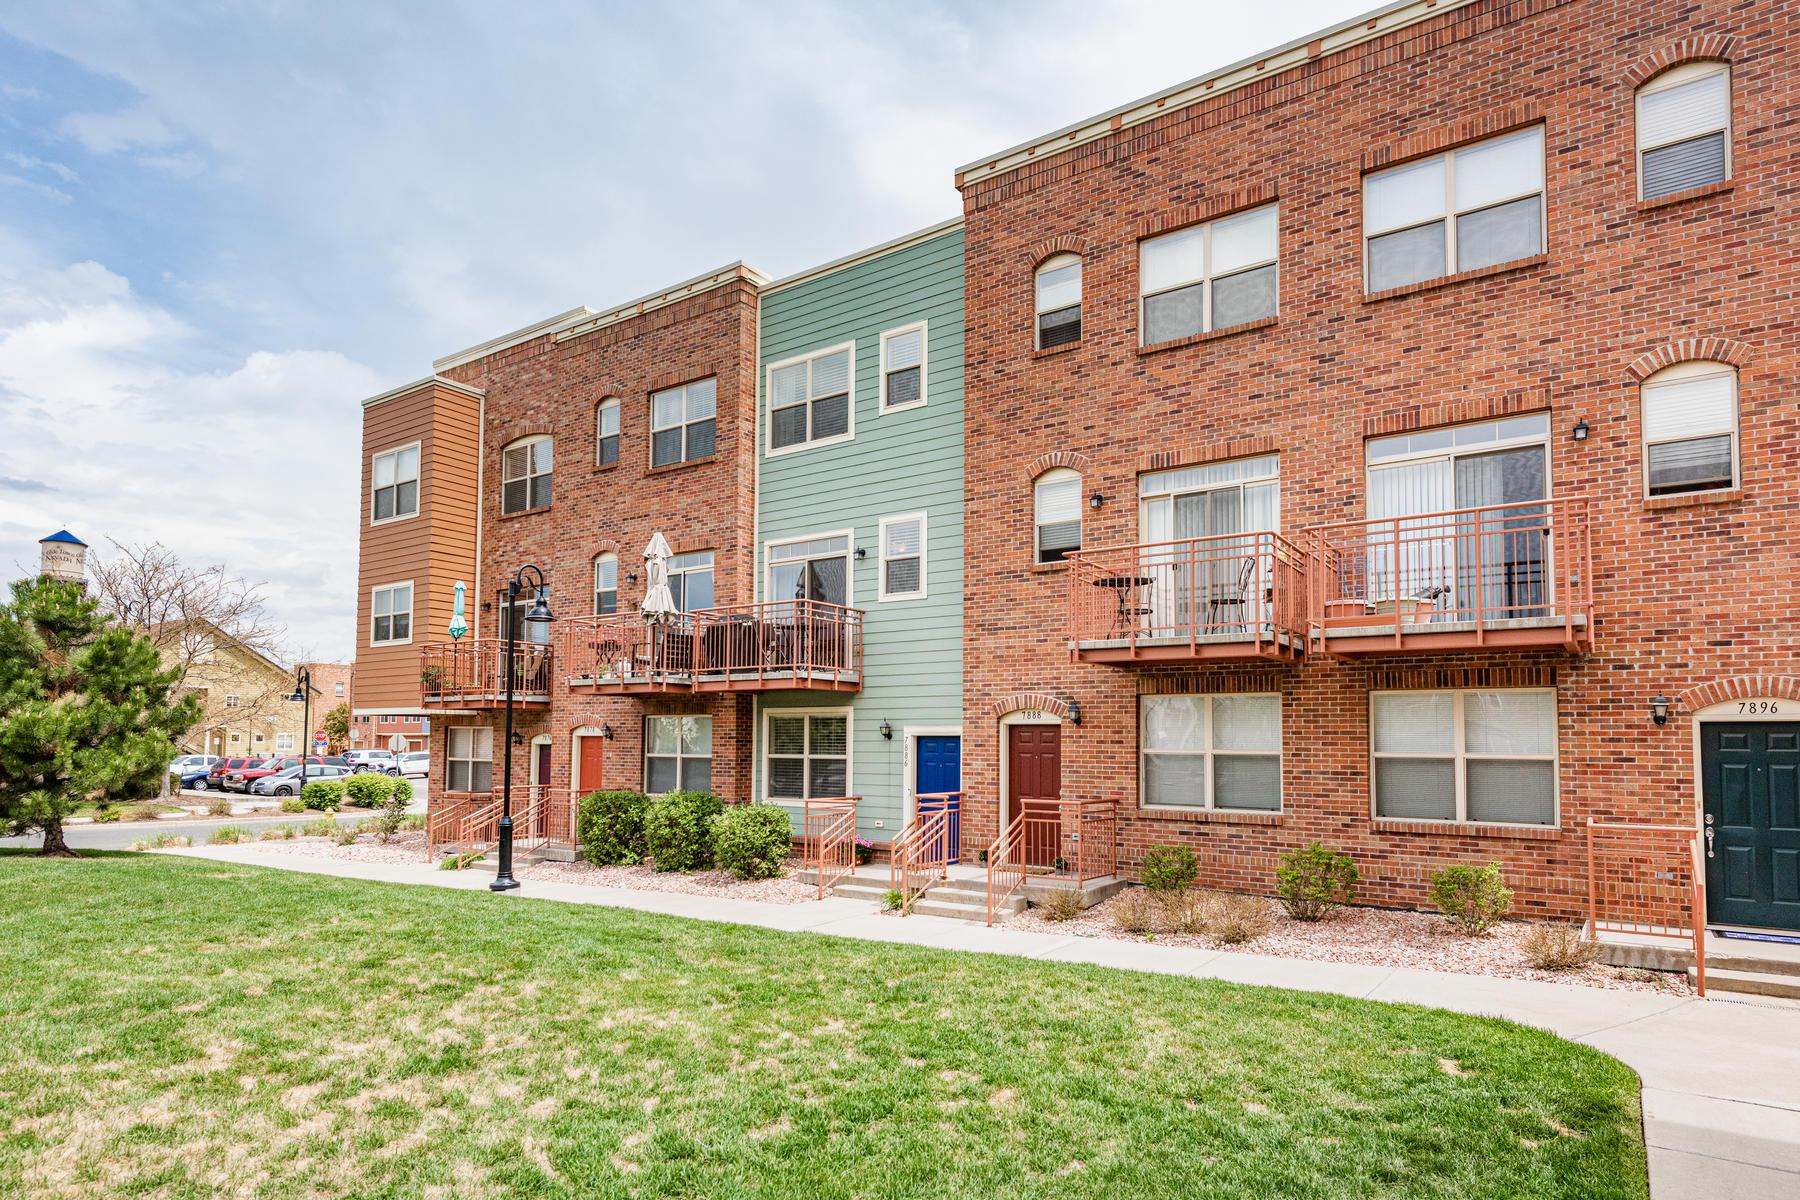 Condominiums for Sale at 7886 W 54th Avenue Arvada, Colorado 80002 United States